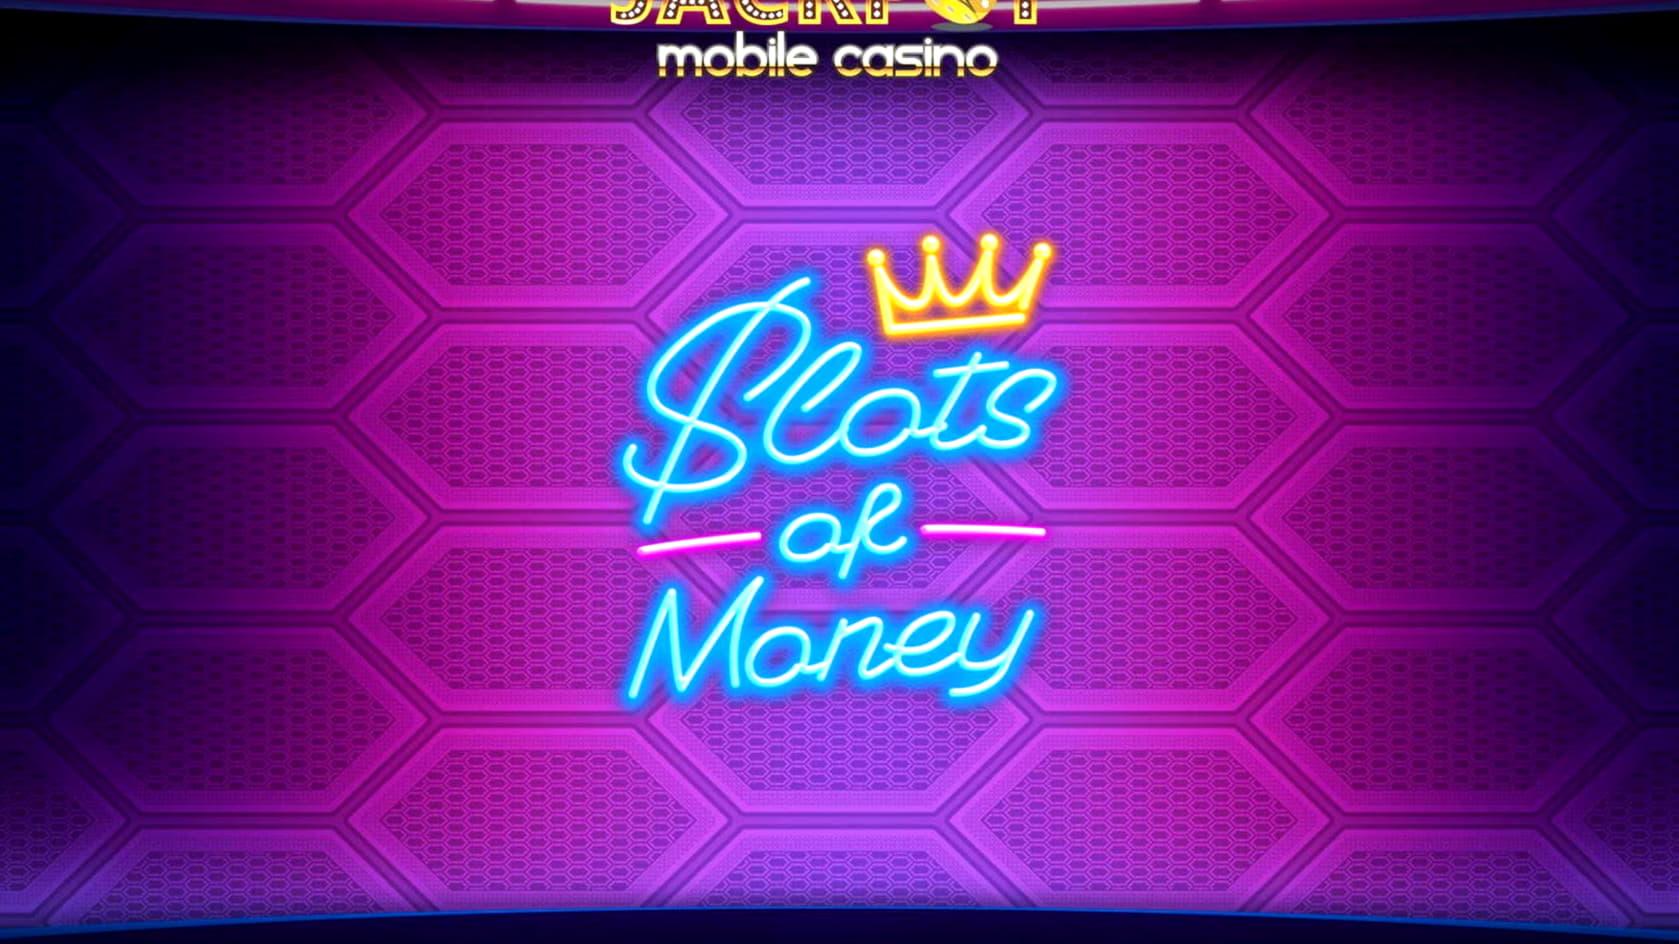 $680 free chip casino at Casino Las Vegas